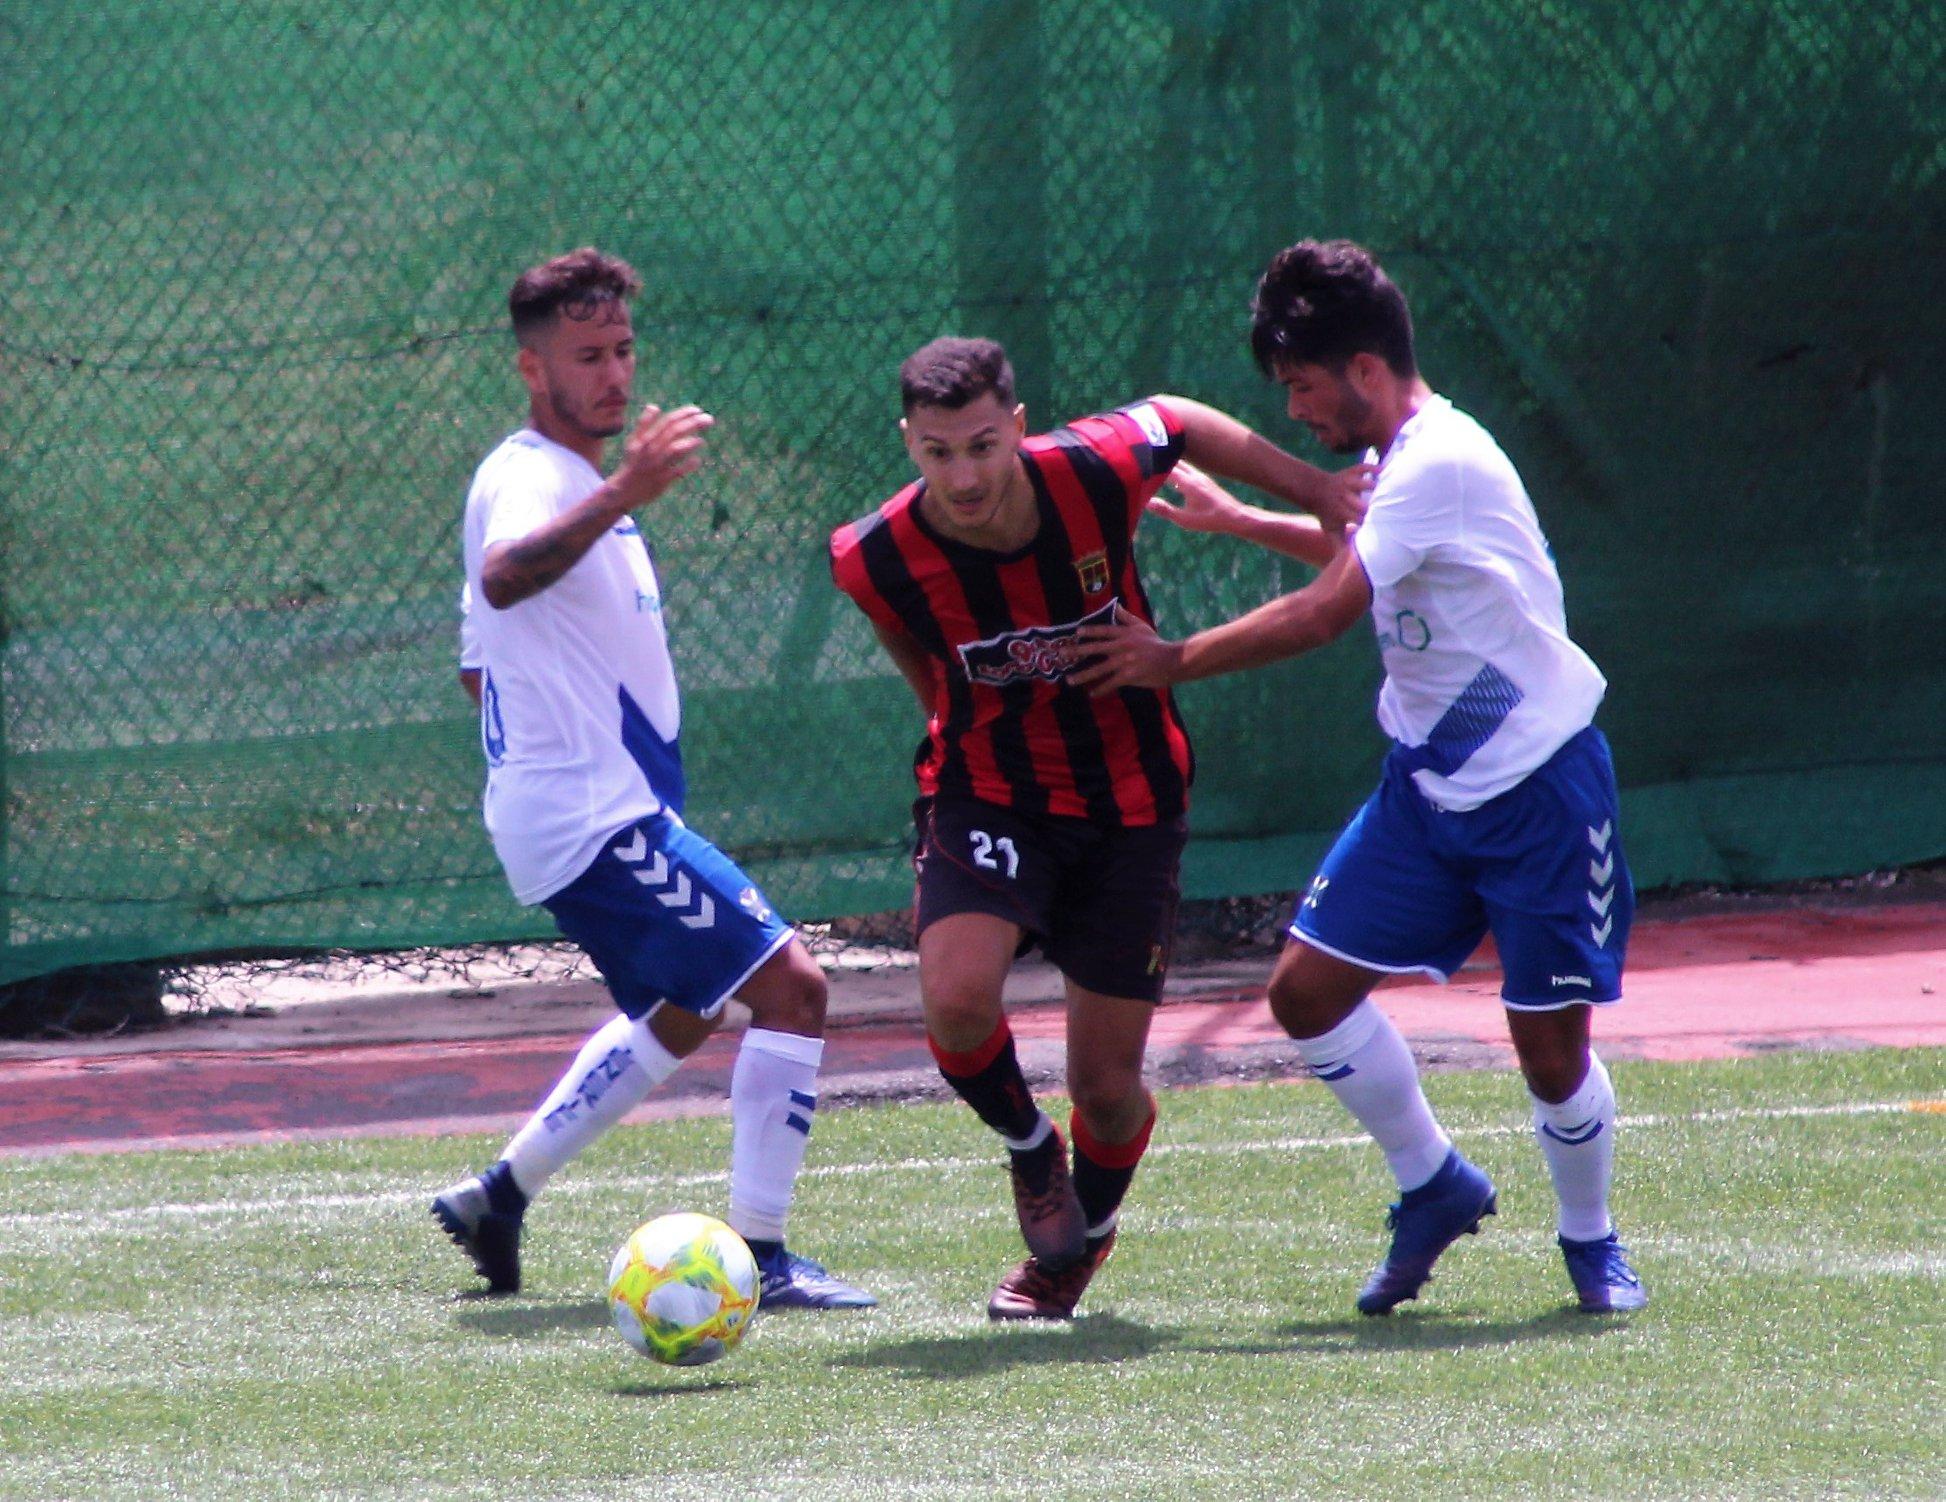 Tenerife B - Unión Viera: Duelo de aspirantes a cara de perro